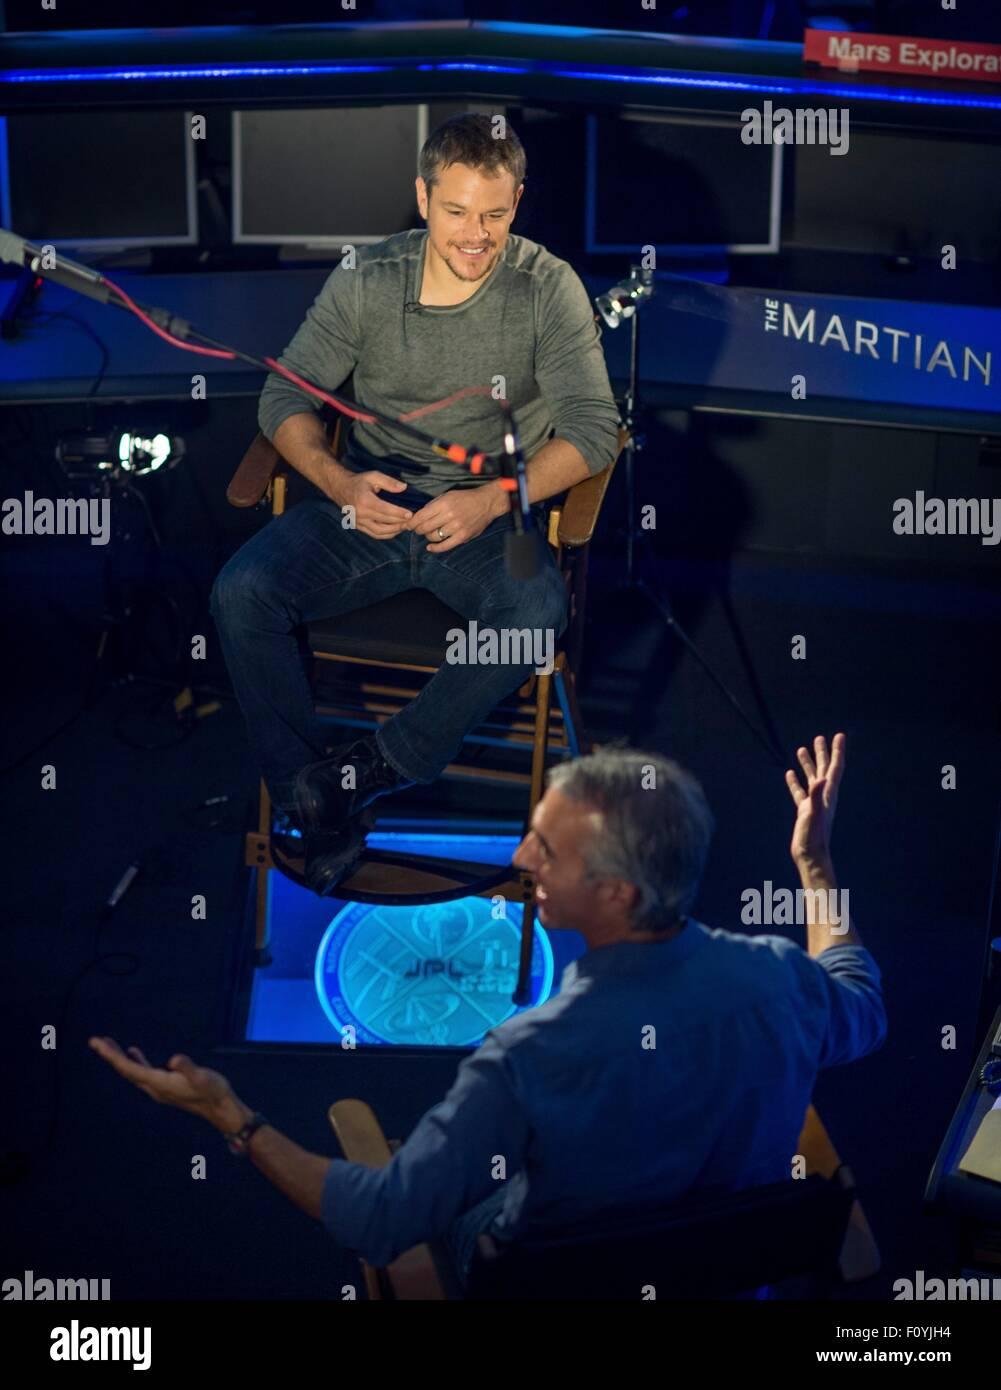 Actor Matt Damon during a visit to the Jet Propulsion Laboratory August 18, 2015 in Pasadena, California. Damon - Stock Image